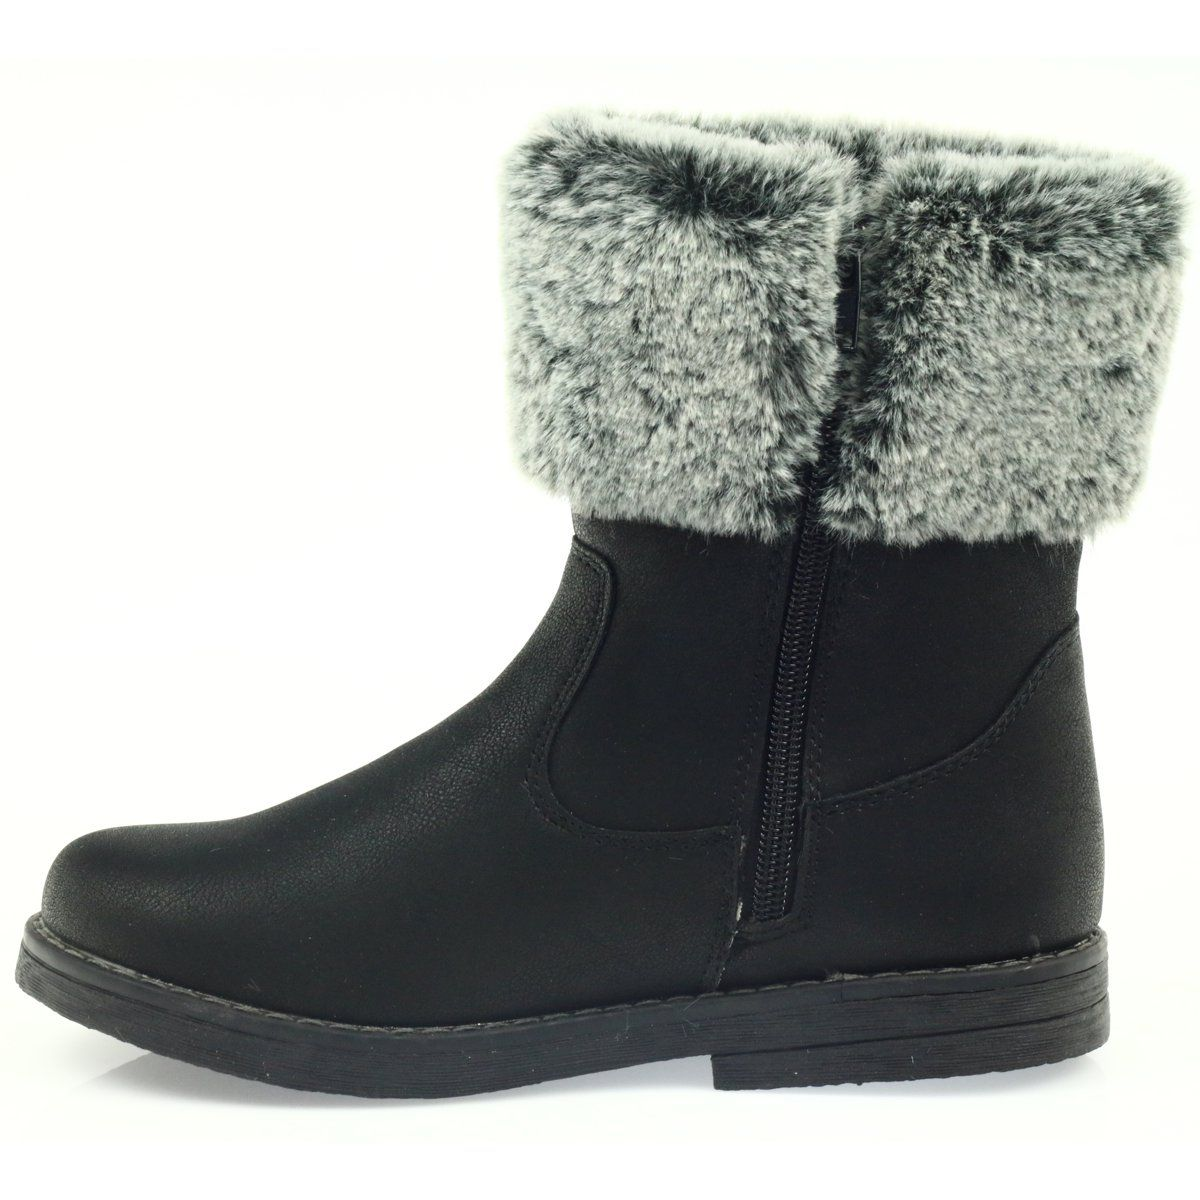 American Club American Kozaczki Buty Zimowe Z Futerkiem Czarne Boots Winter Boots Fur Boots